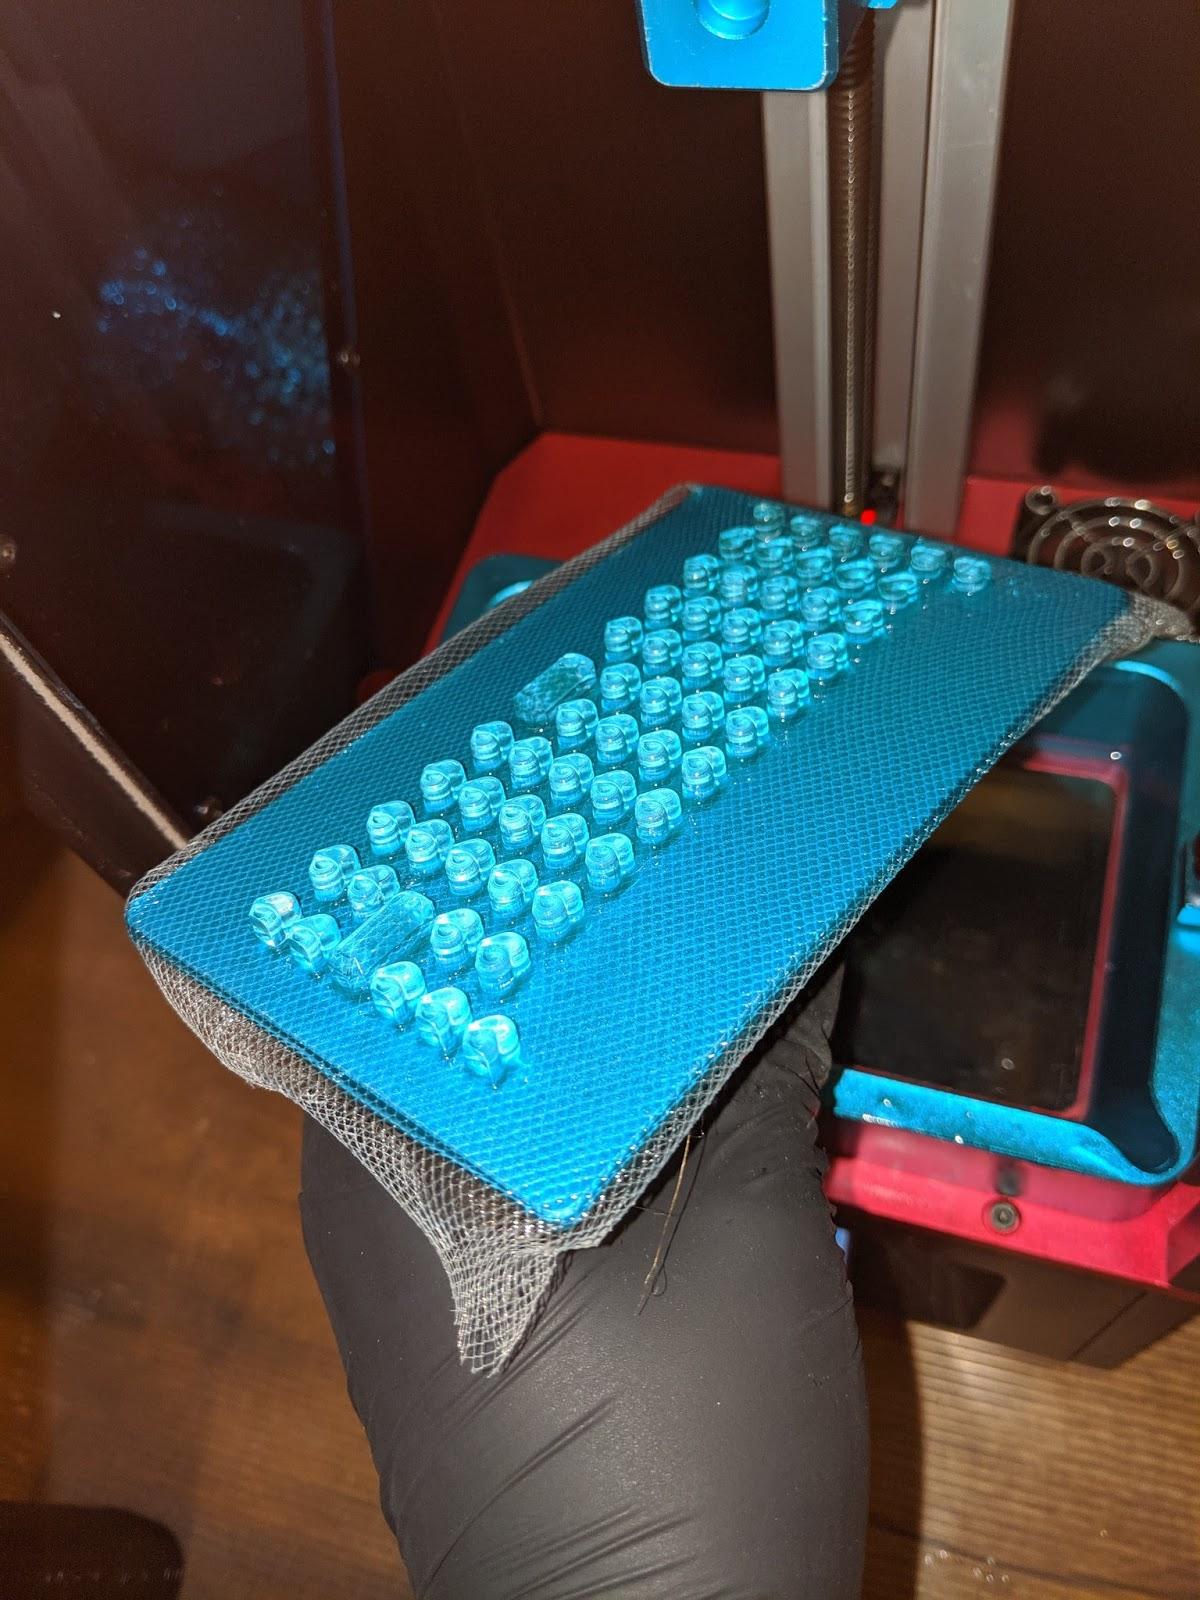 cloth-mounted membrane keyboard